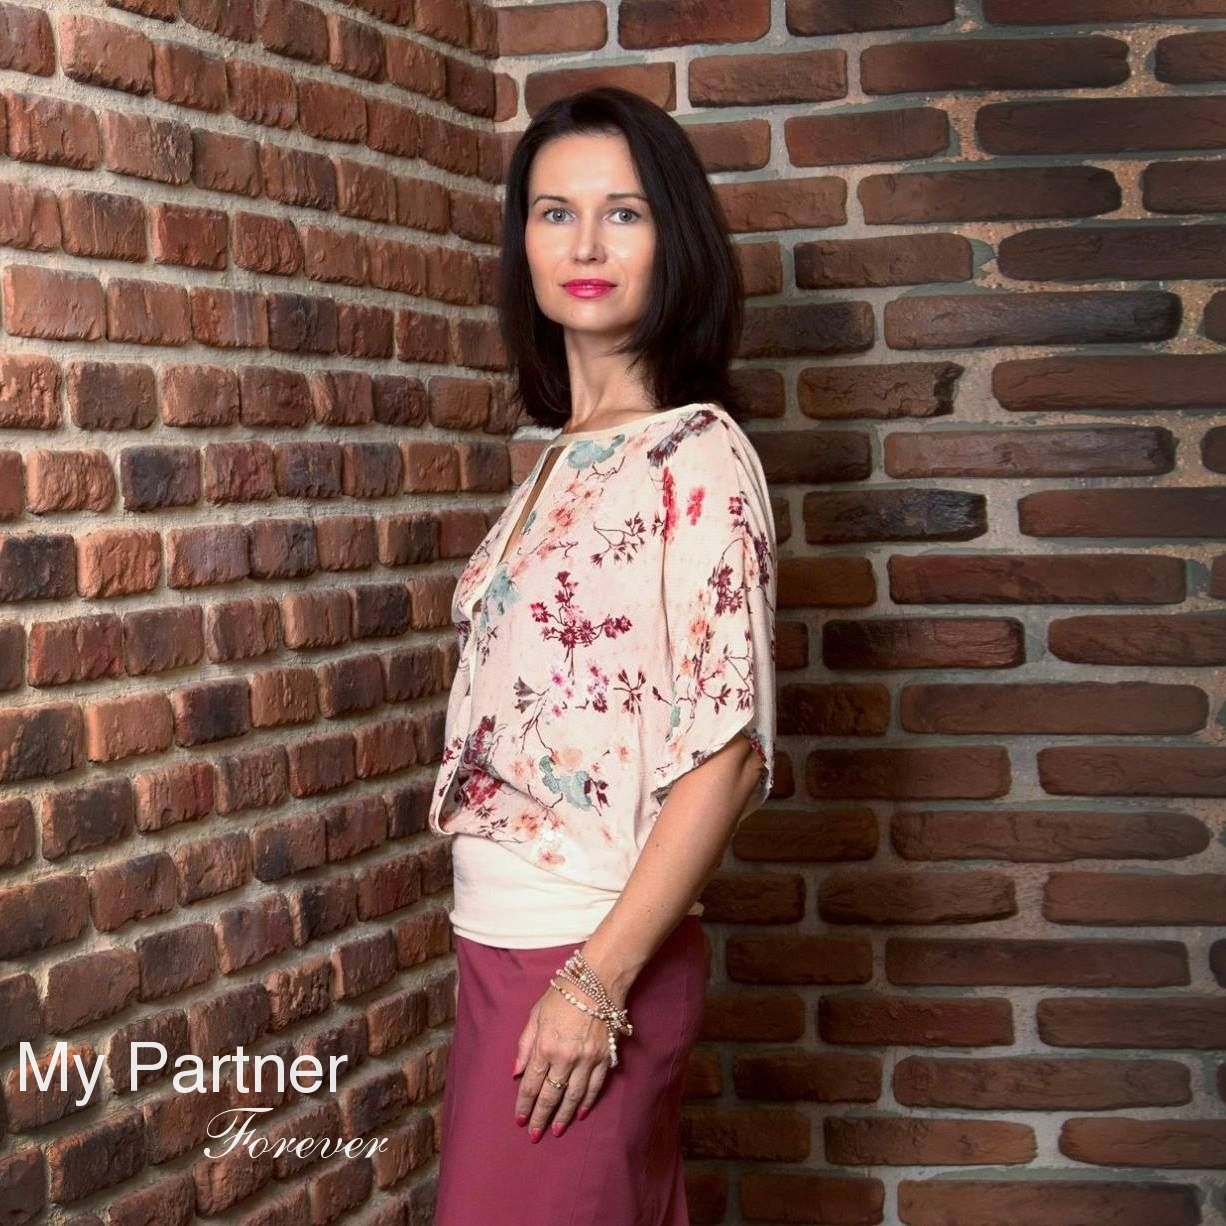 Dating Site to Meet Gorgeous Ukrainian Woman Evgeniya from Kiev, Ukraine